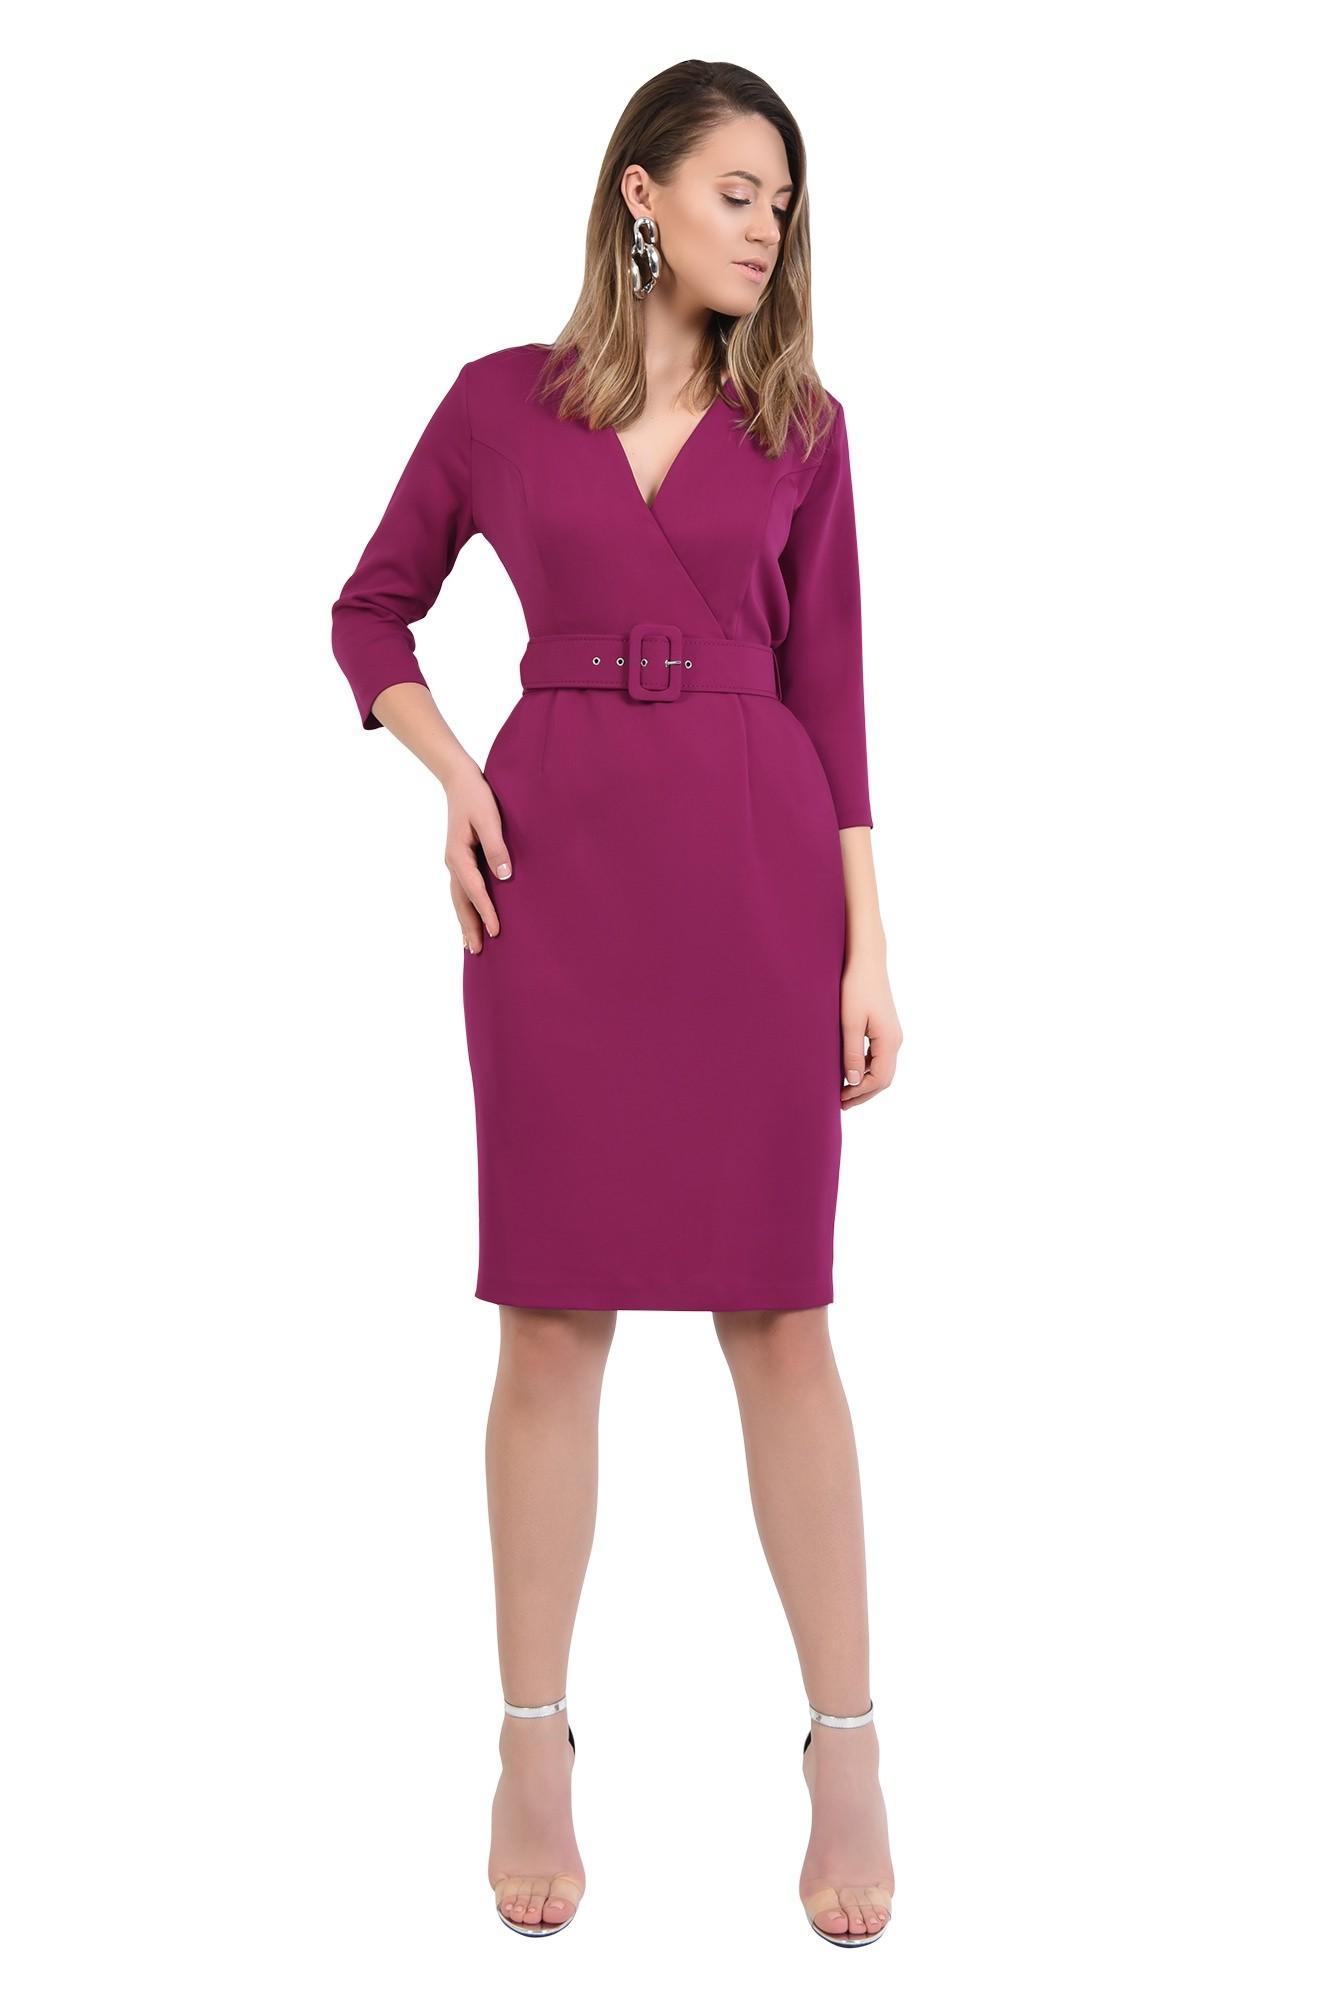 3 - 360 - rochie magenta, office, conica, cu centura